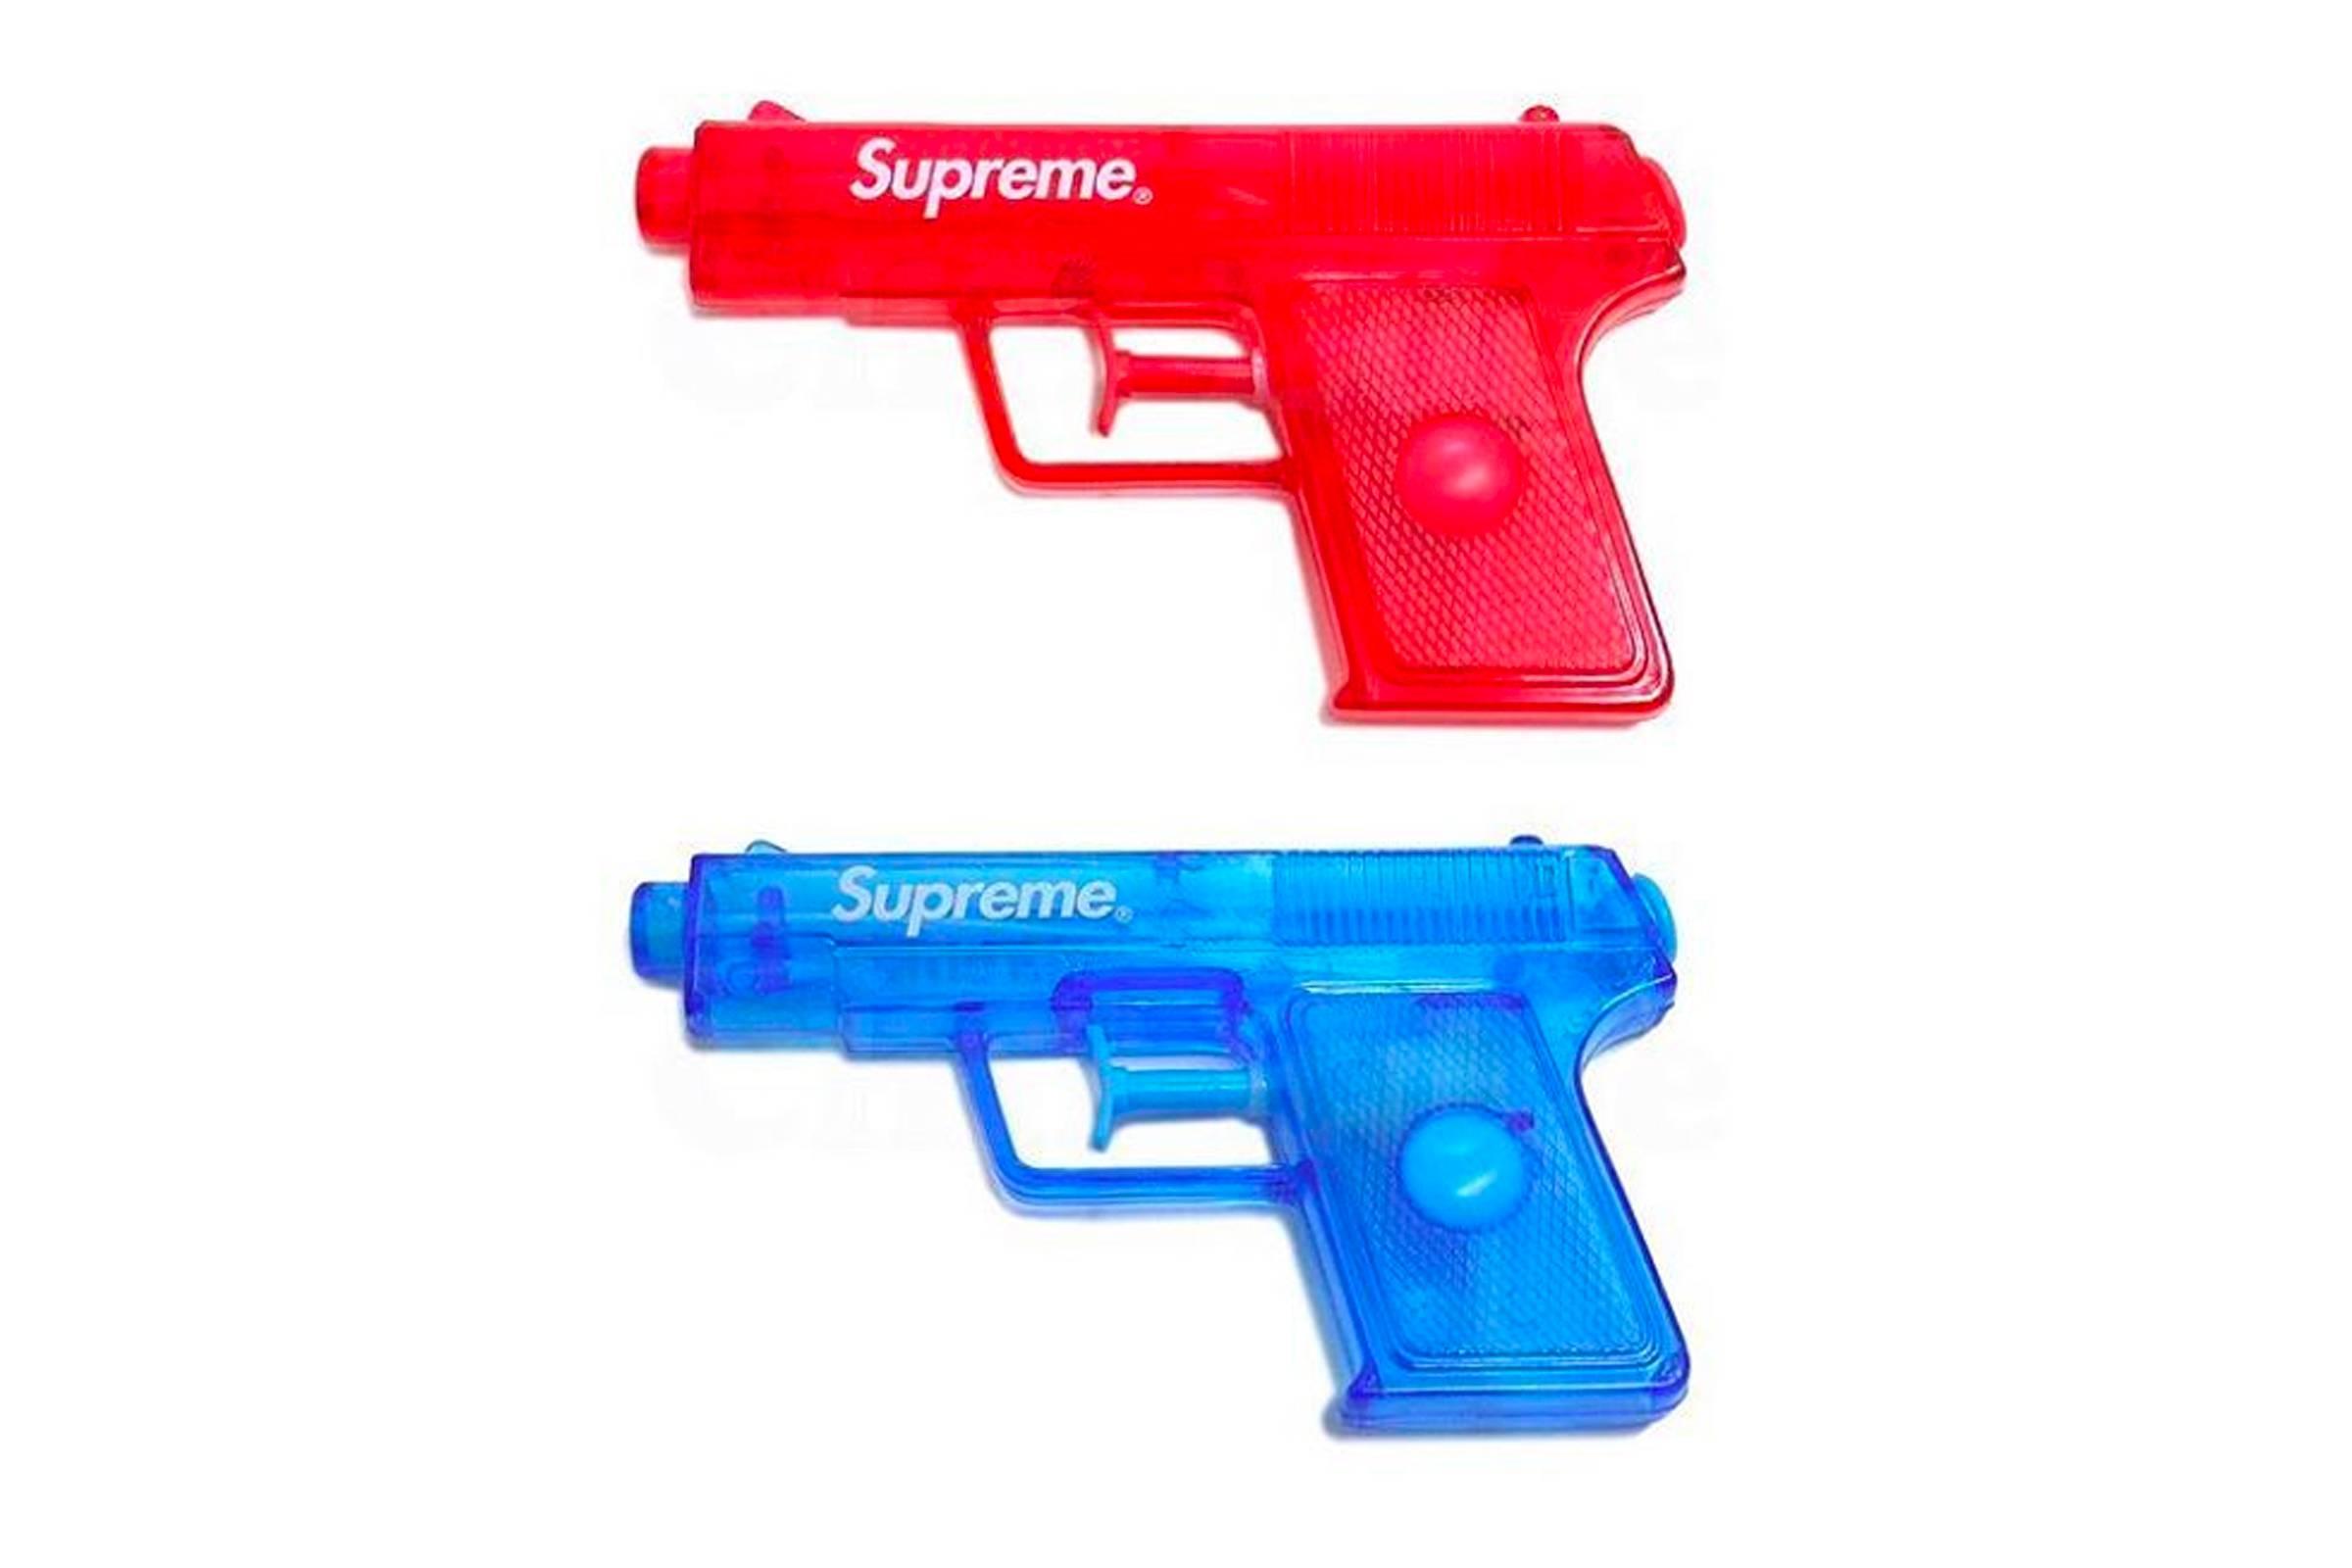 Supreme Water Pistol (Spring/Summer 2011)